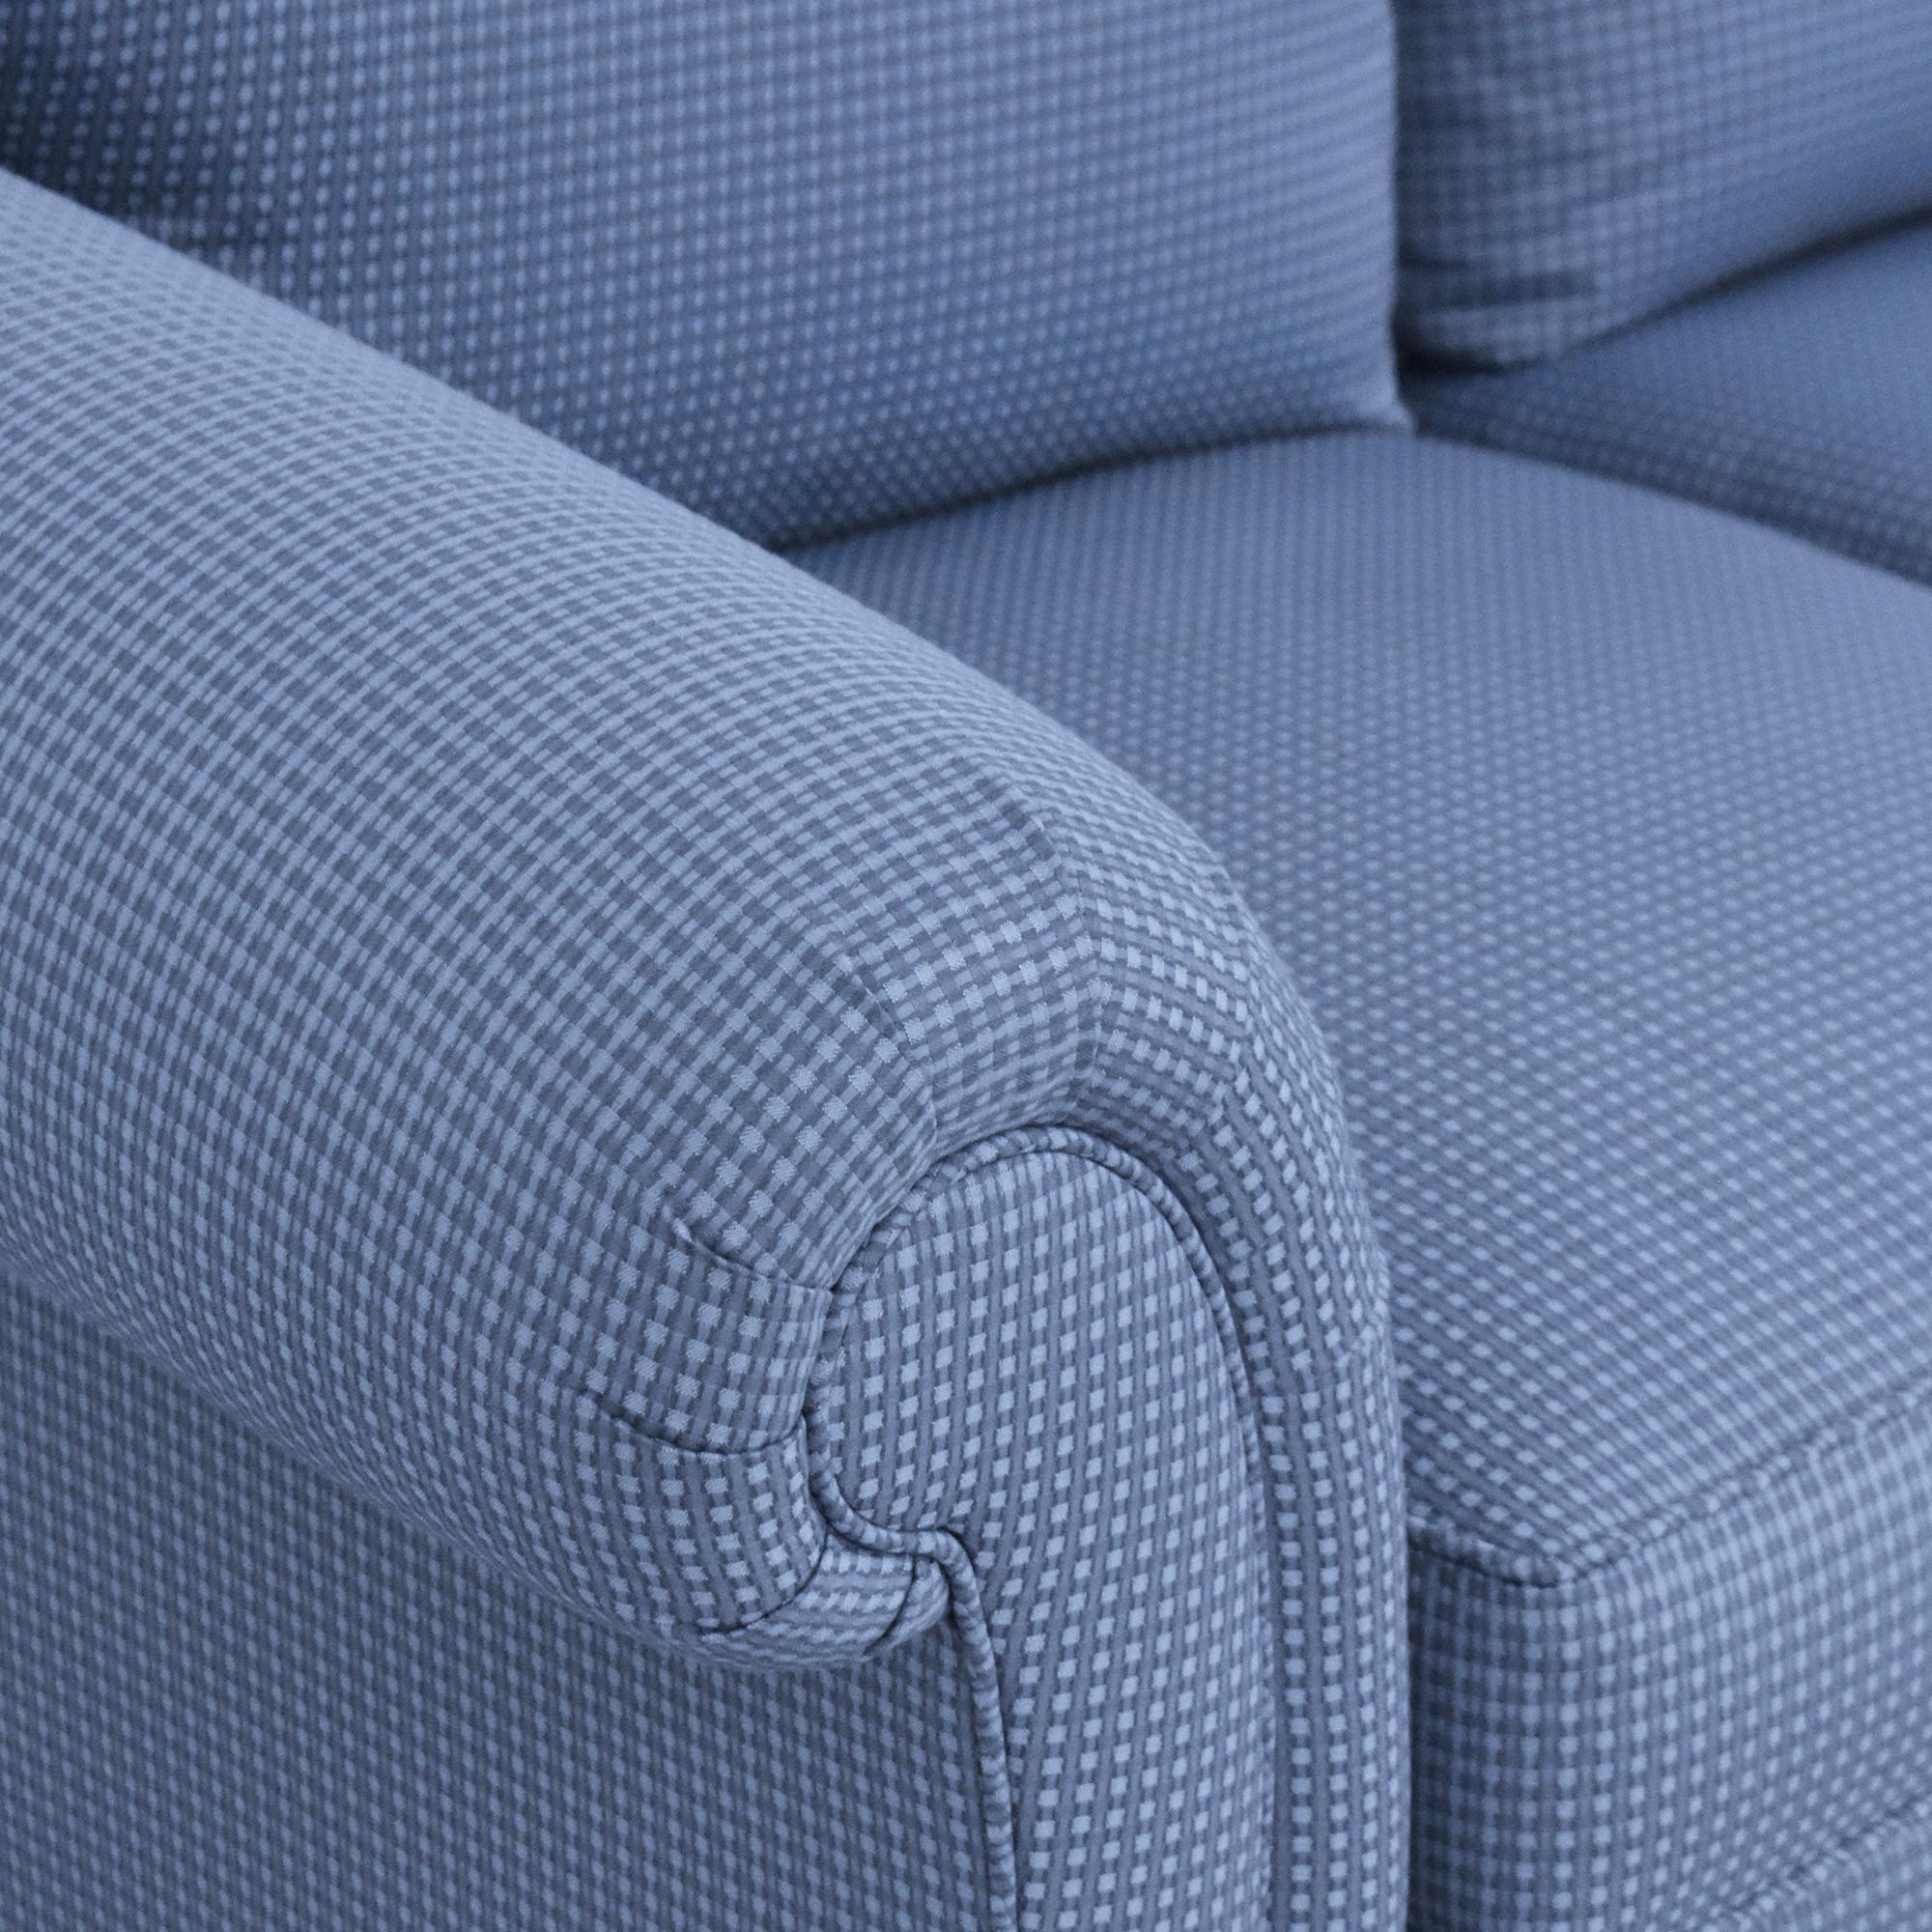 Kindel Kindel Sleigh Arm Sofa Classic Sofas